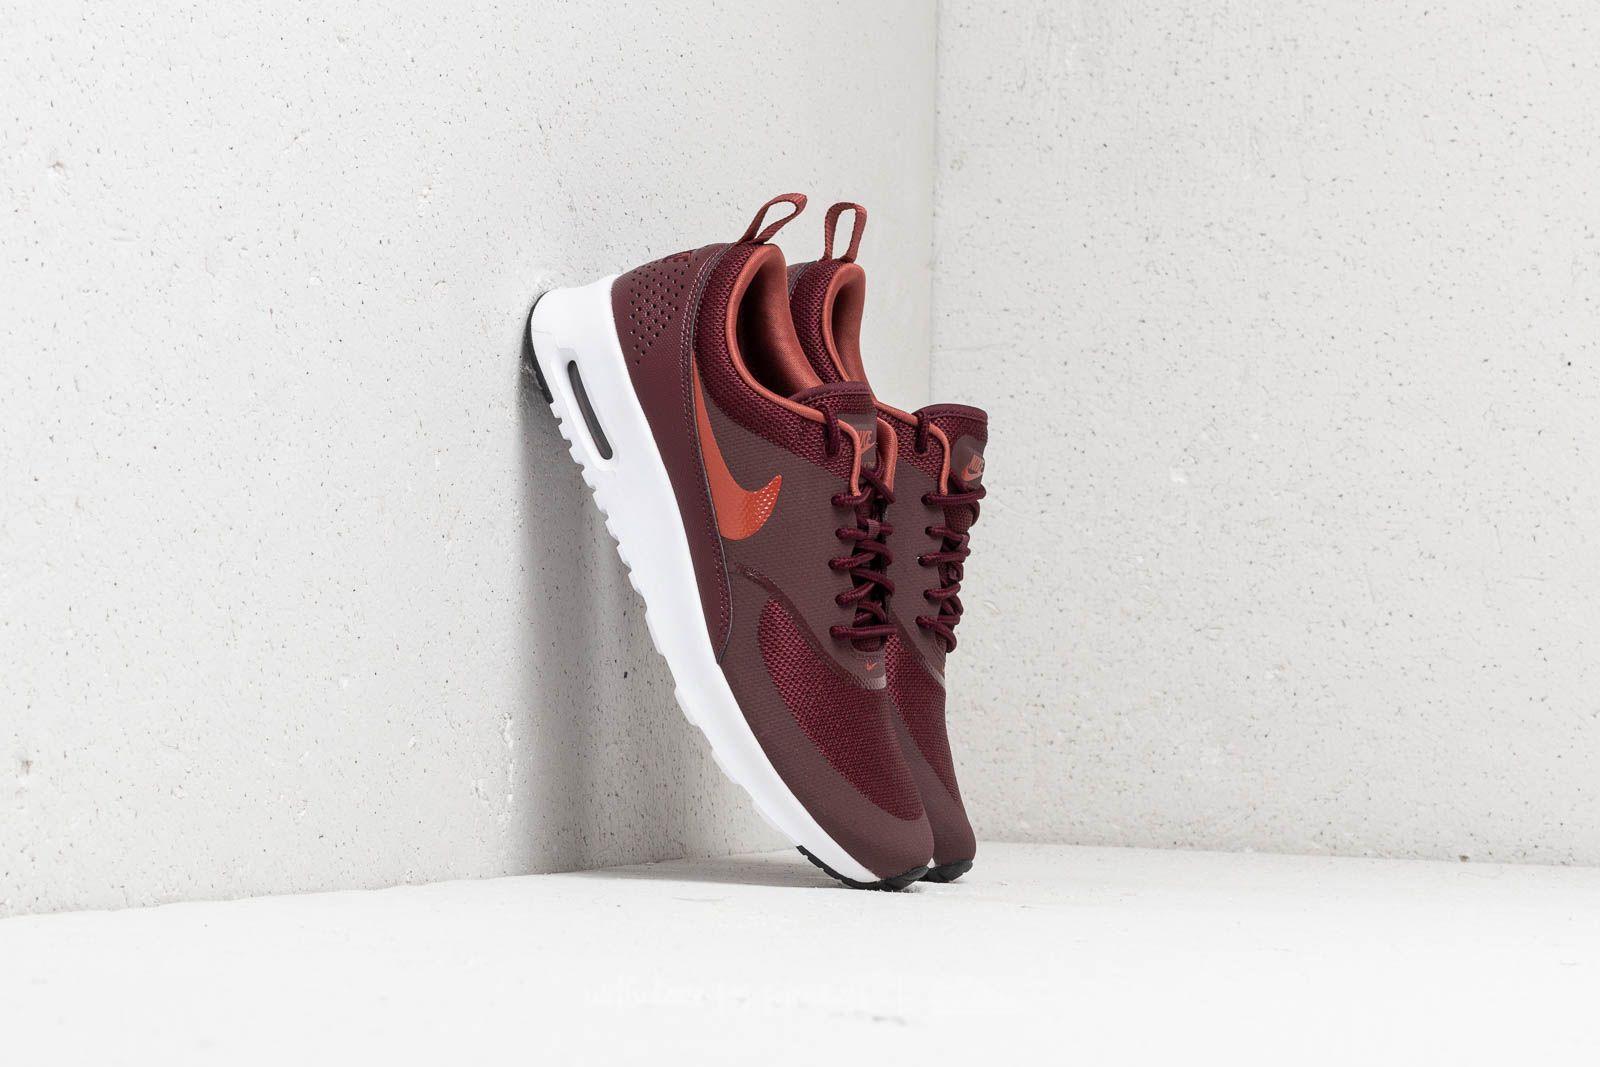 Nike WMNS Air Max Thea Burgundy Crush Burnt Orange | Footshop